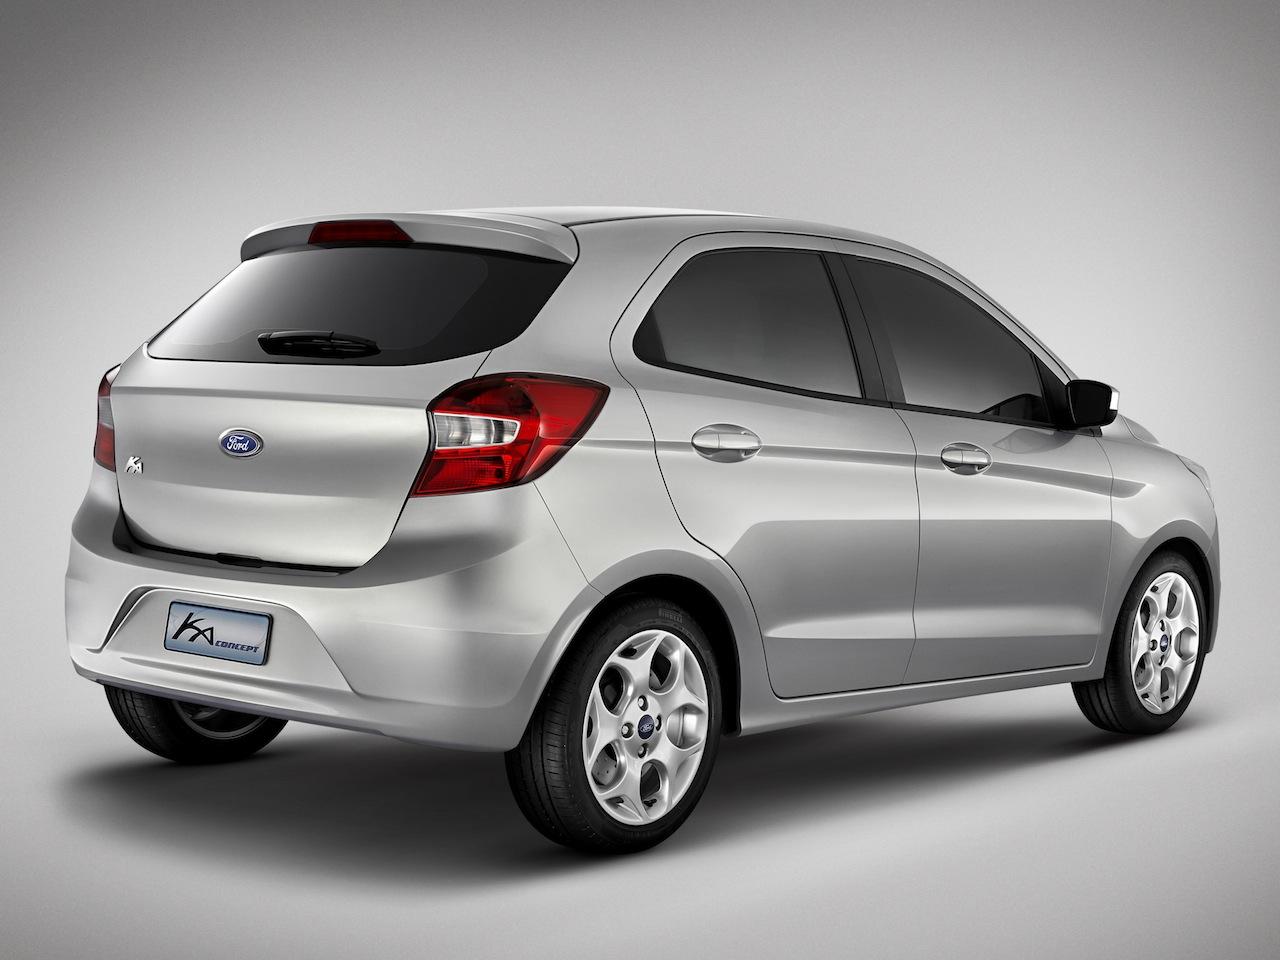 New Ford Ka Concept rear quarters